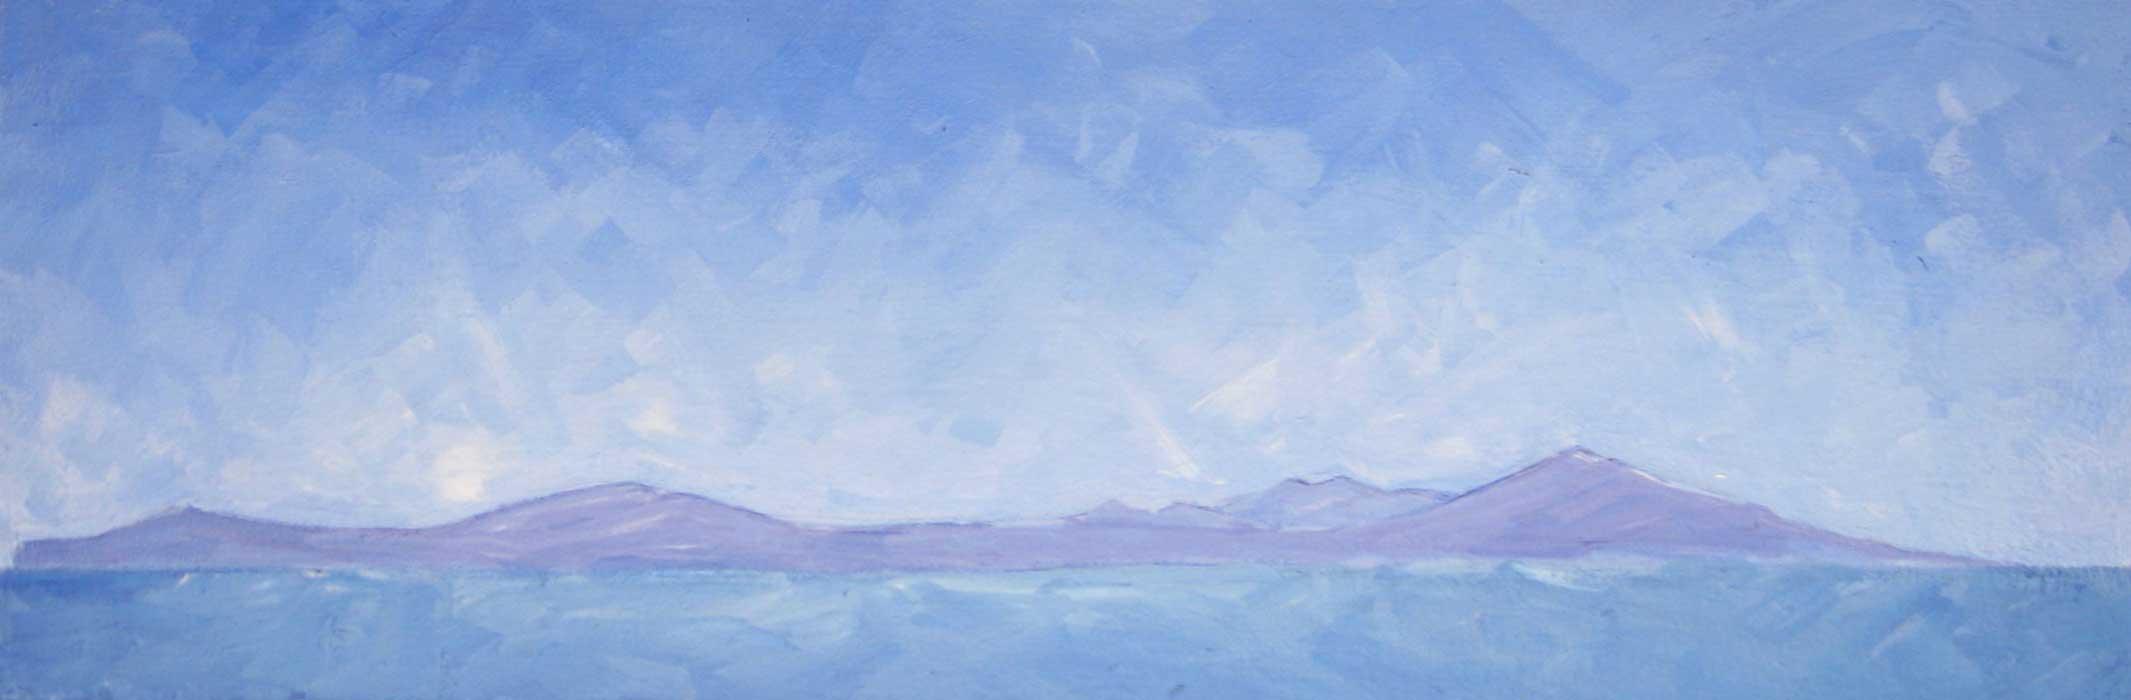 0064 earth sea sky #2 - paint